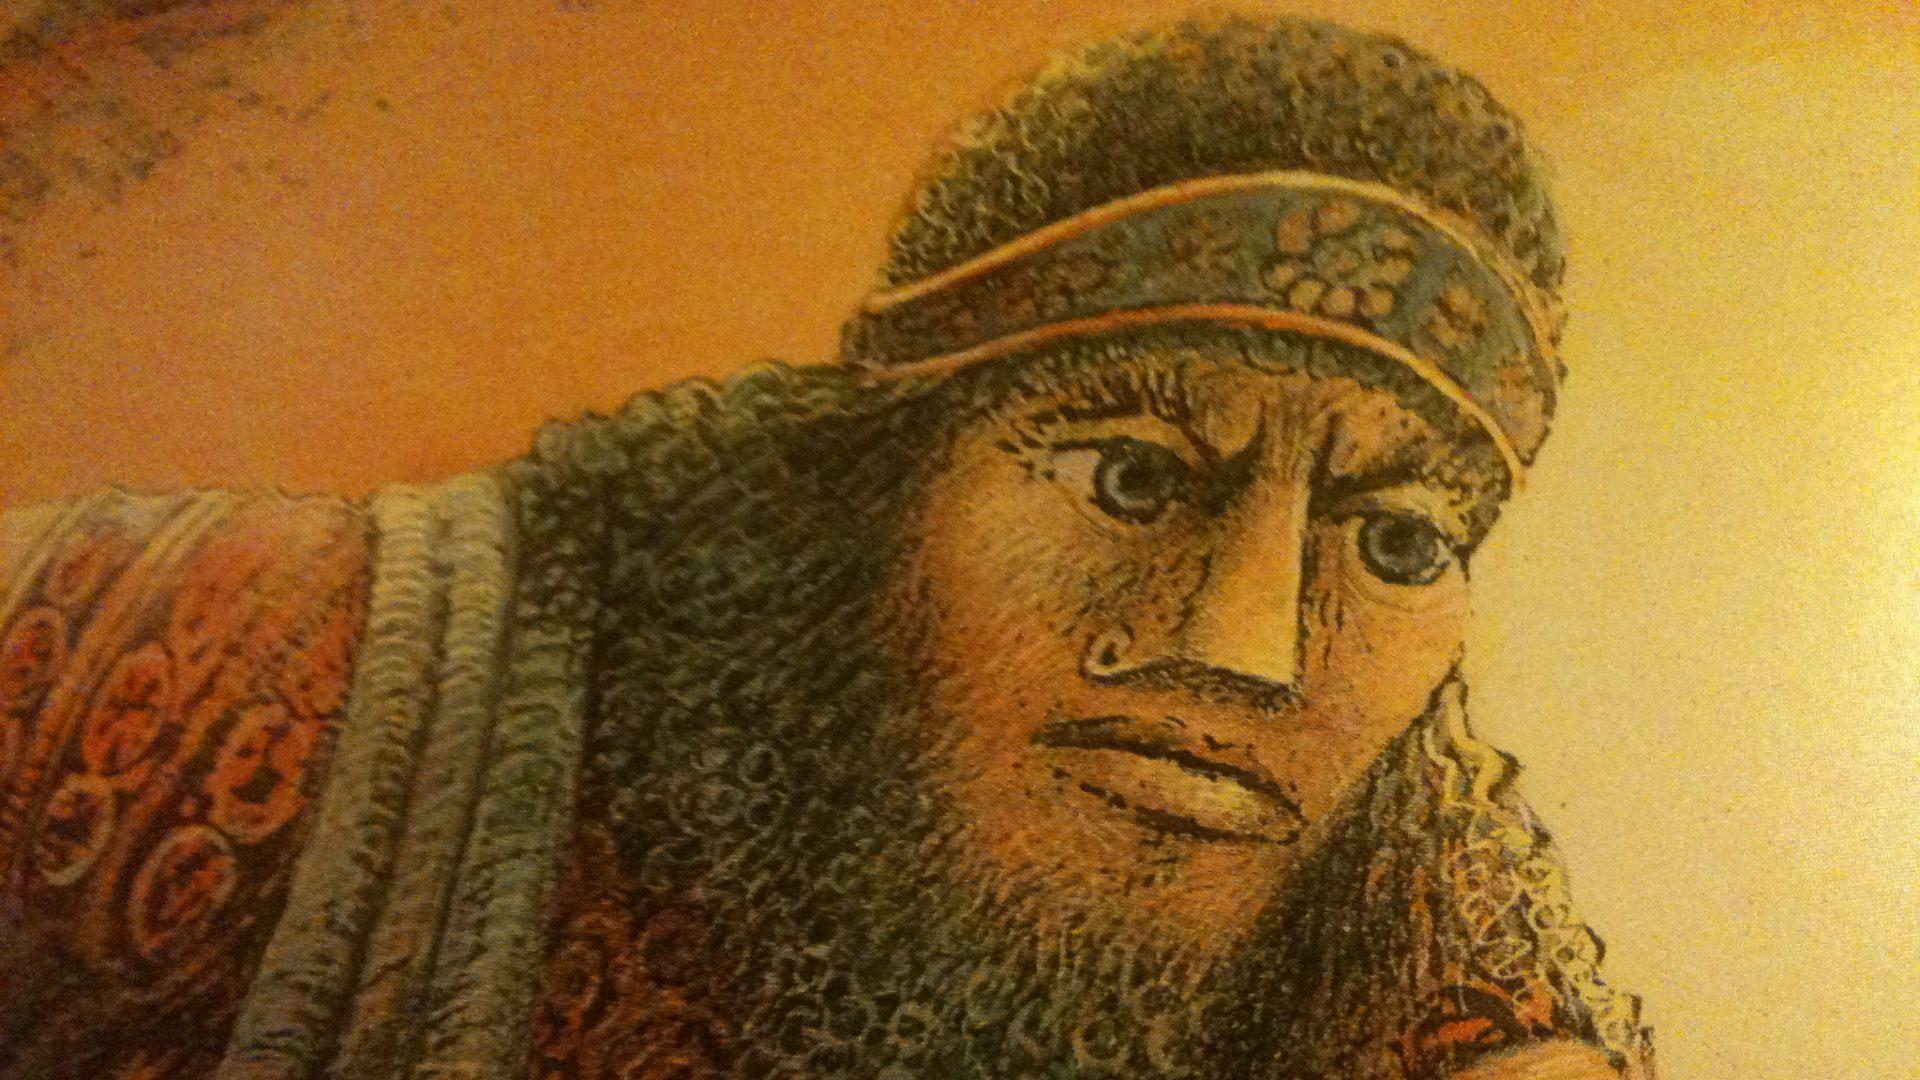 The Epics Of Gilgamesh 5 Key Sumerian Myths And Legends